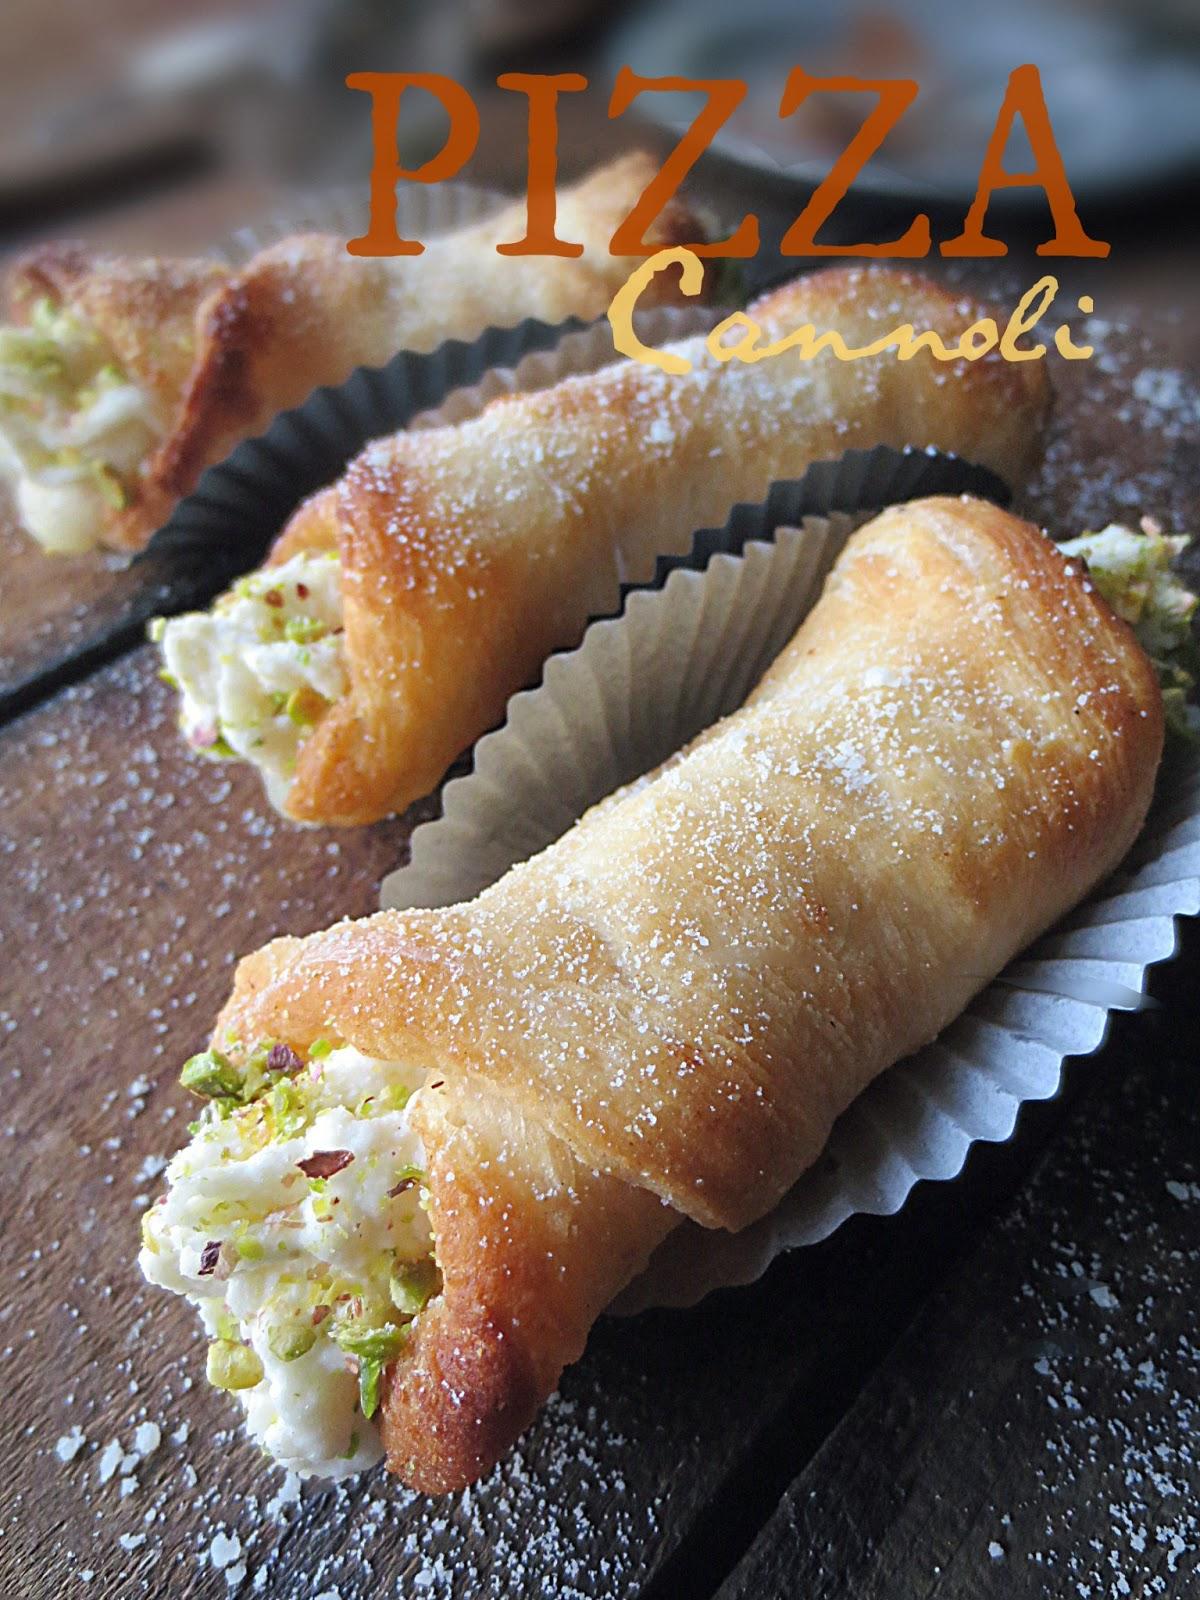 The Brooklyn Ragazza: Award-Winning, Sicilian Pizza Cannoli